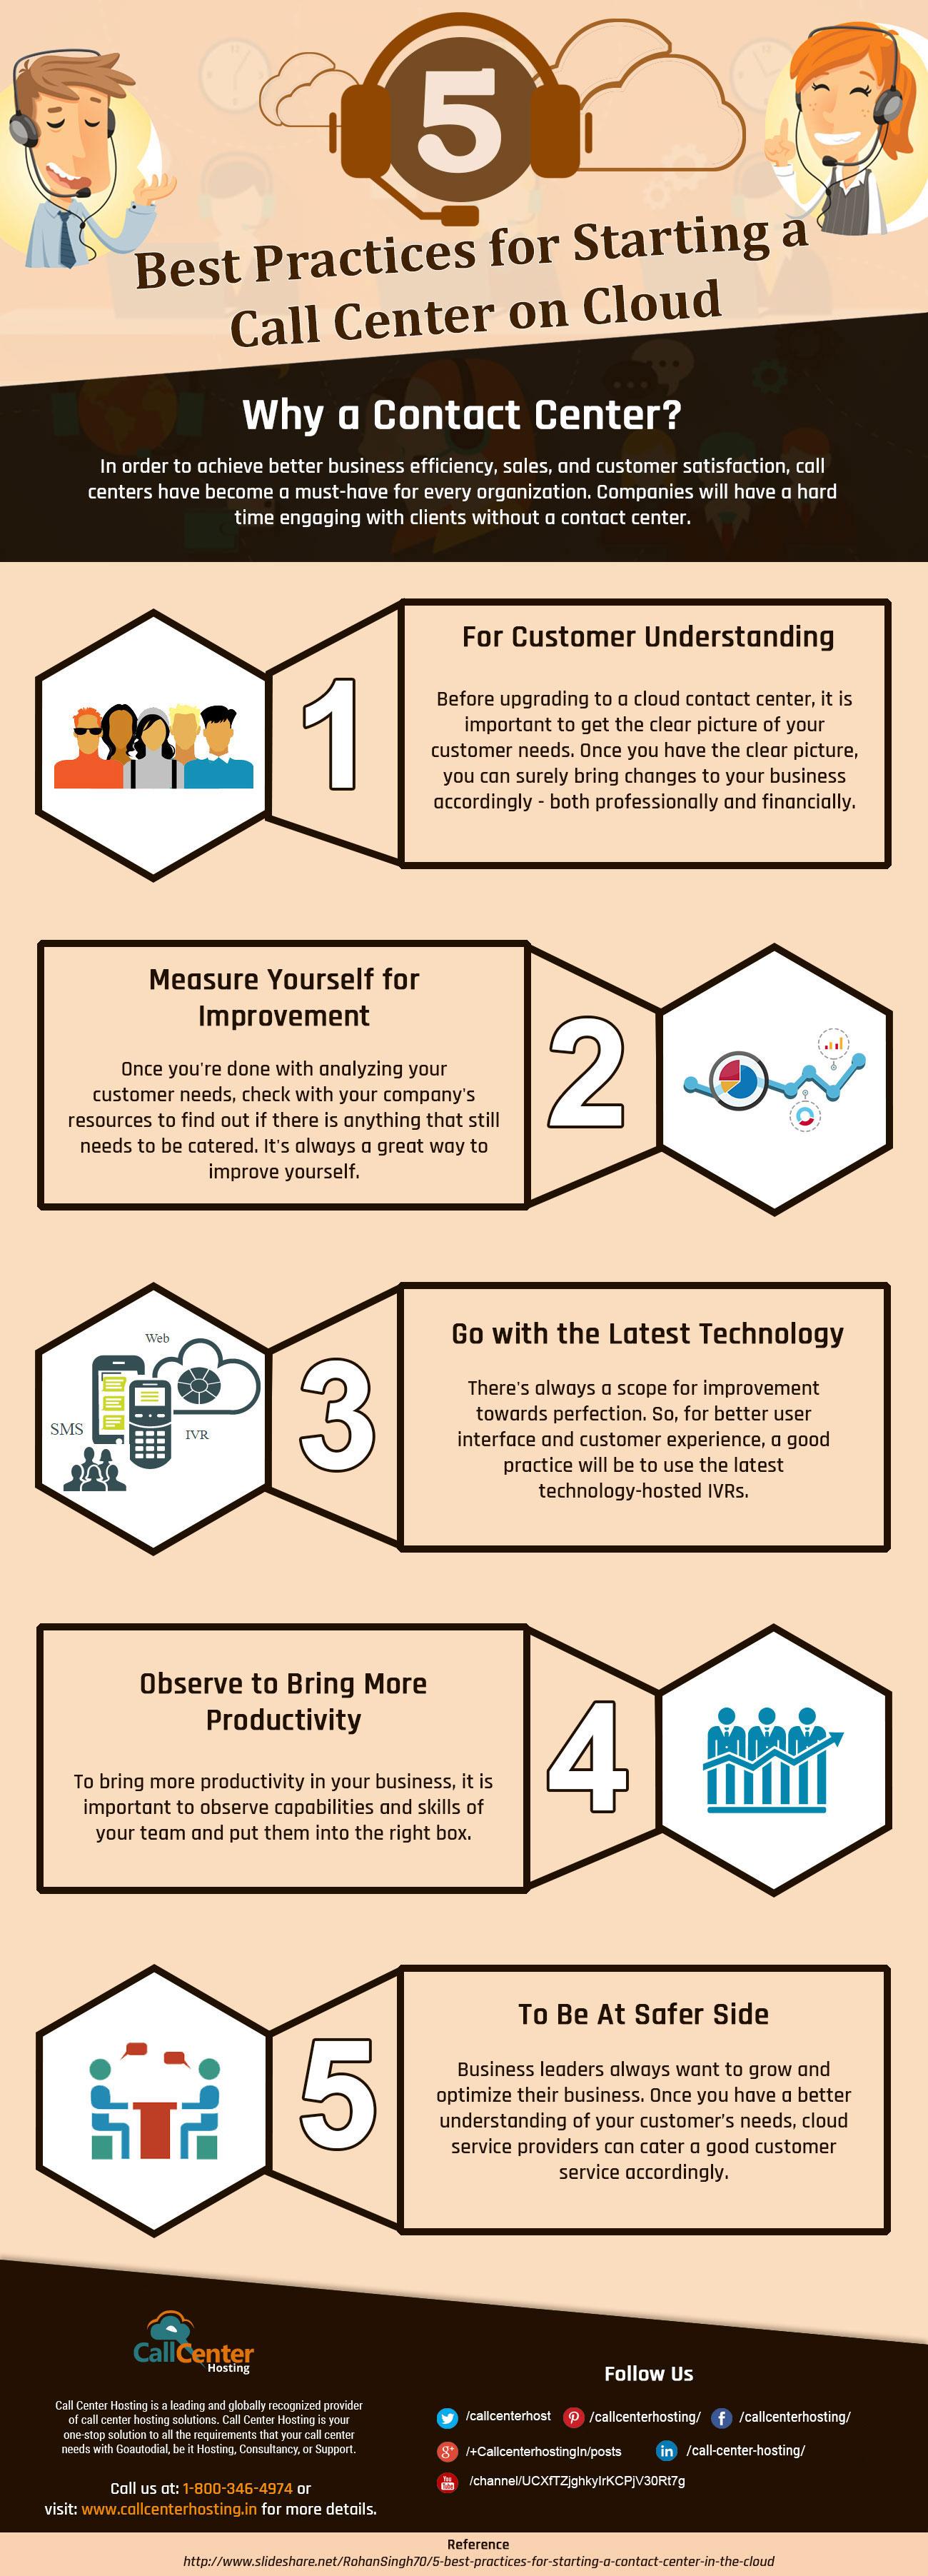 Infographic- Start a Call Center on Cloud